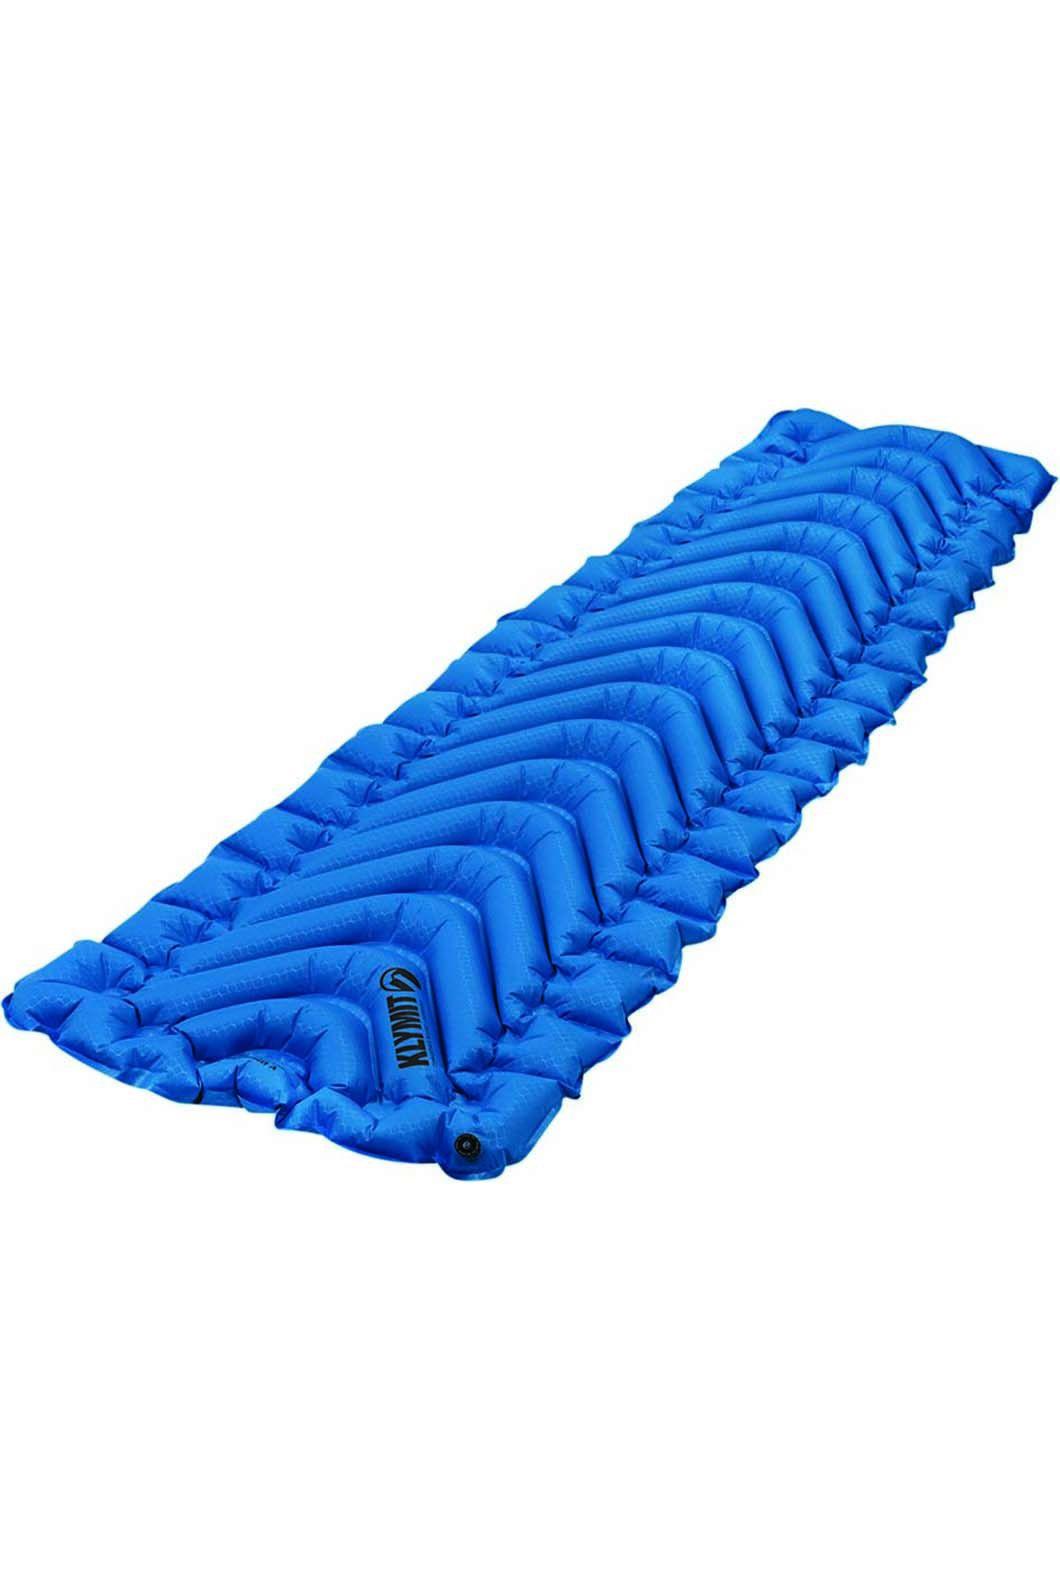 Klymit Static V Ultralite Inflatable Mat, None, hi-res